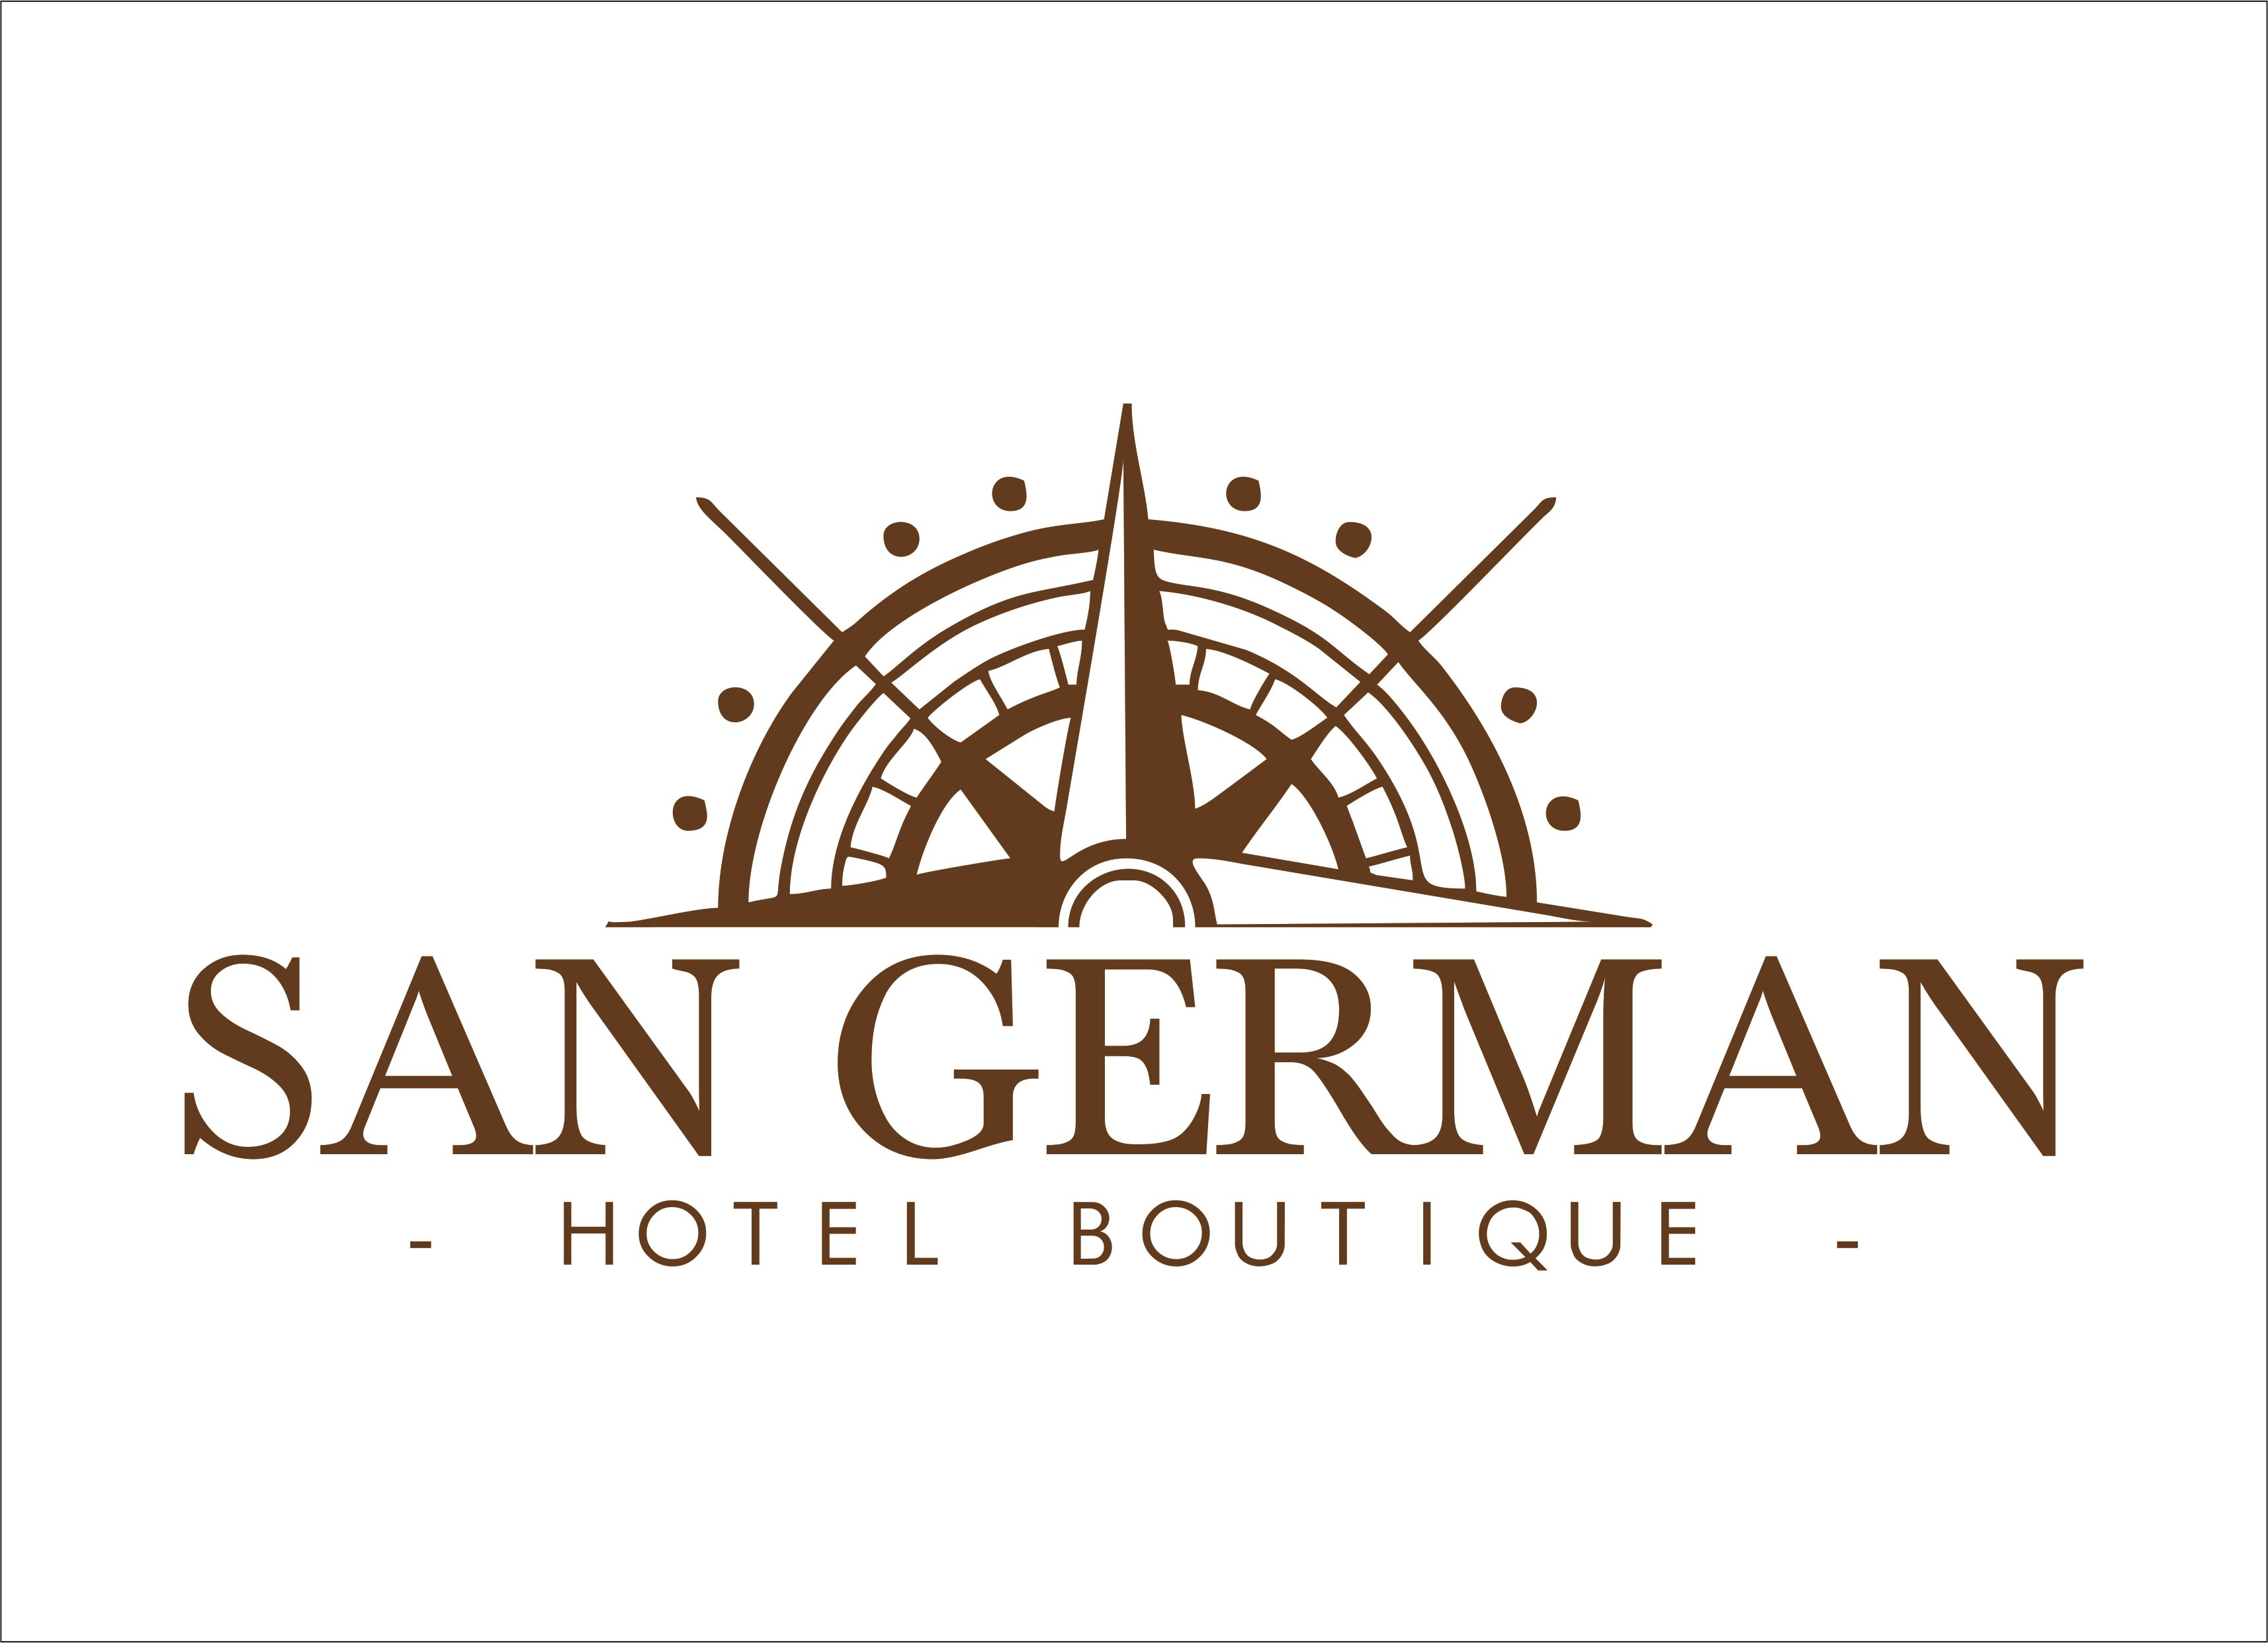 HOTEL SAN GERMAN